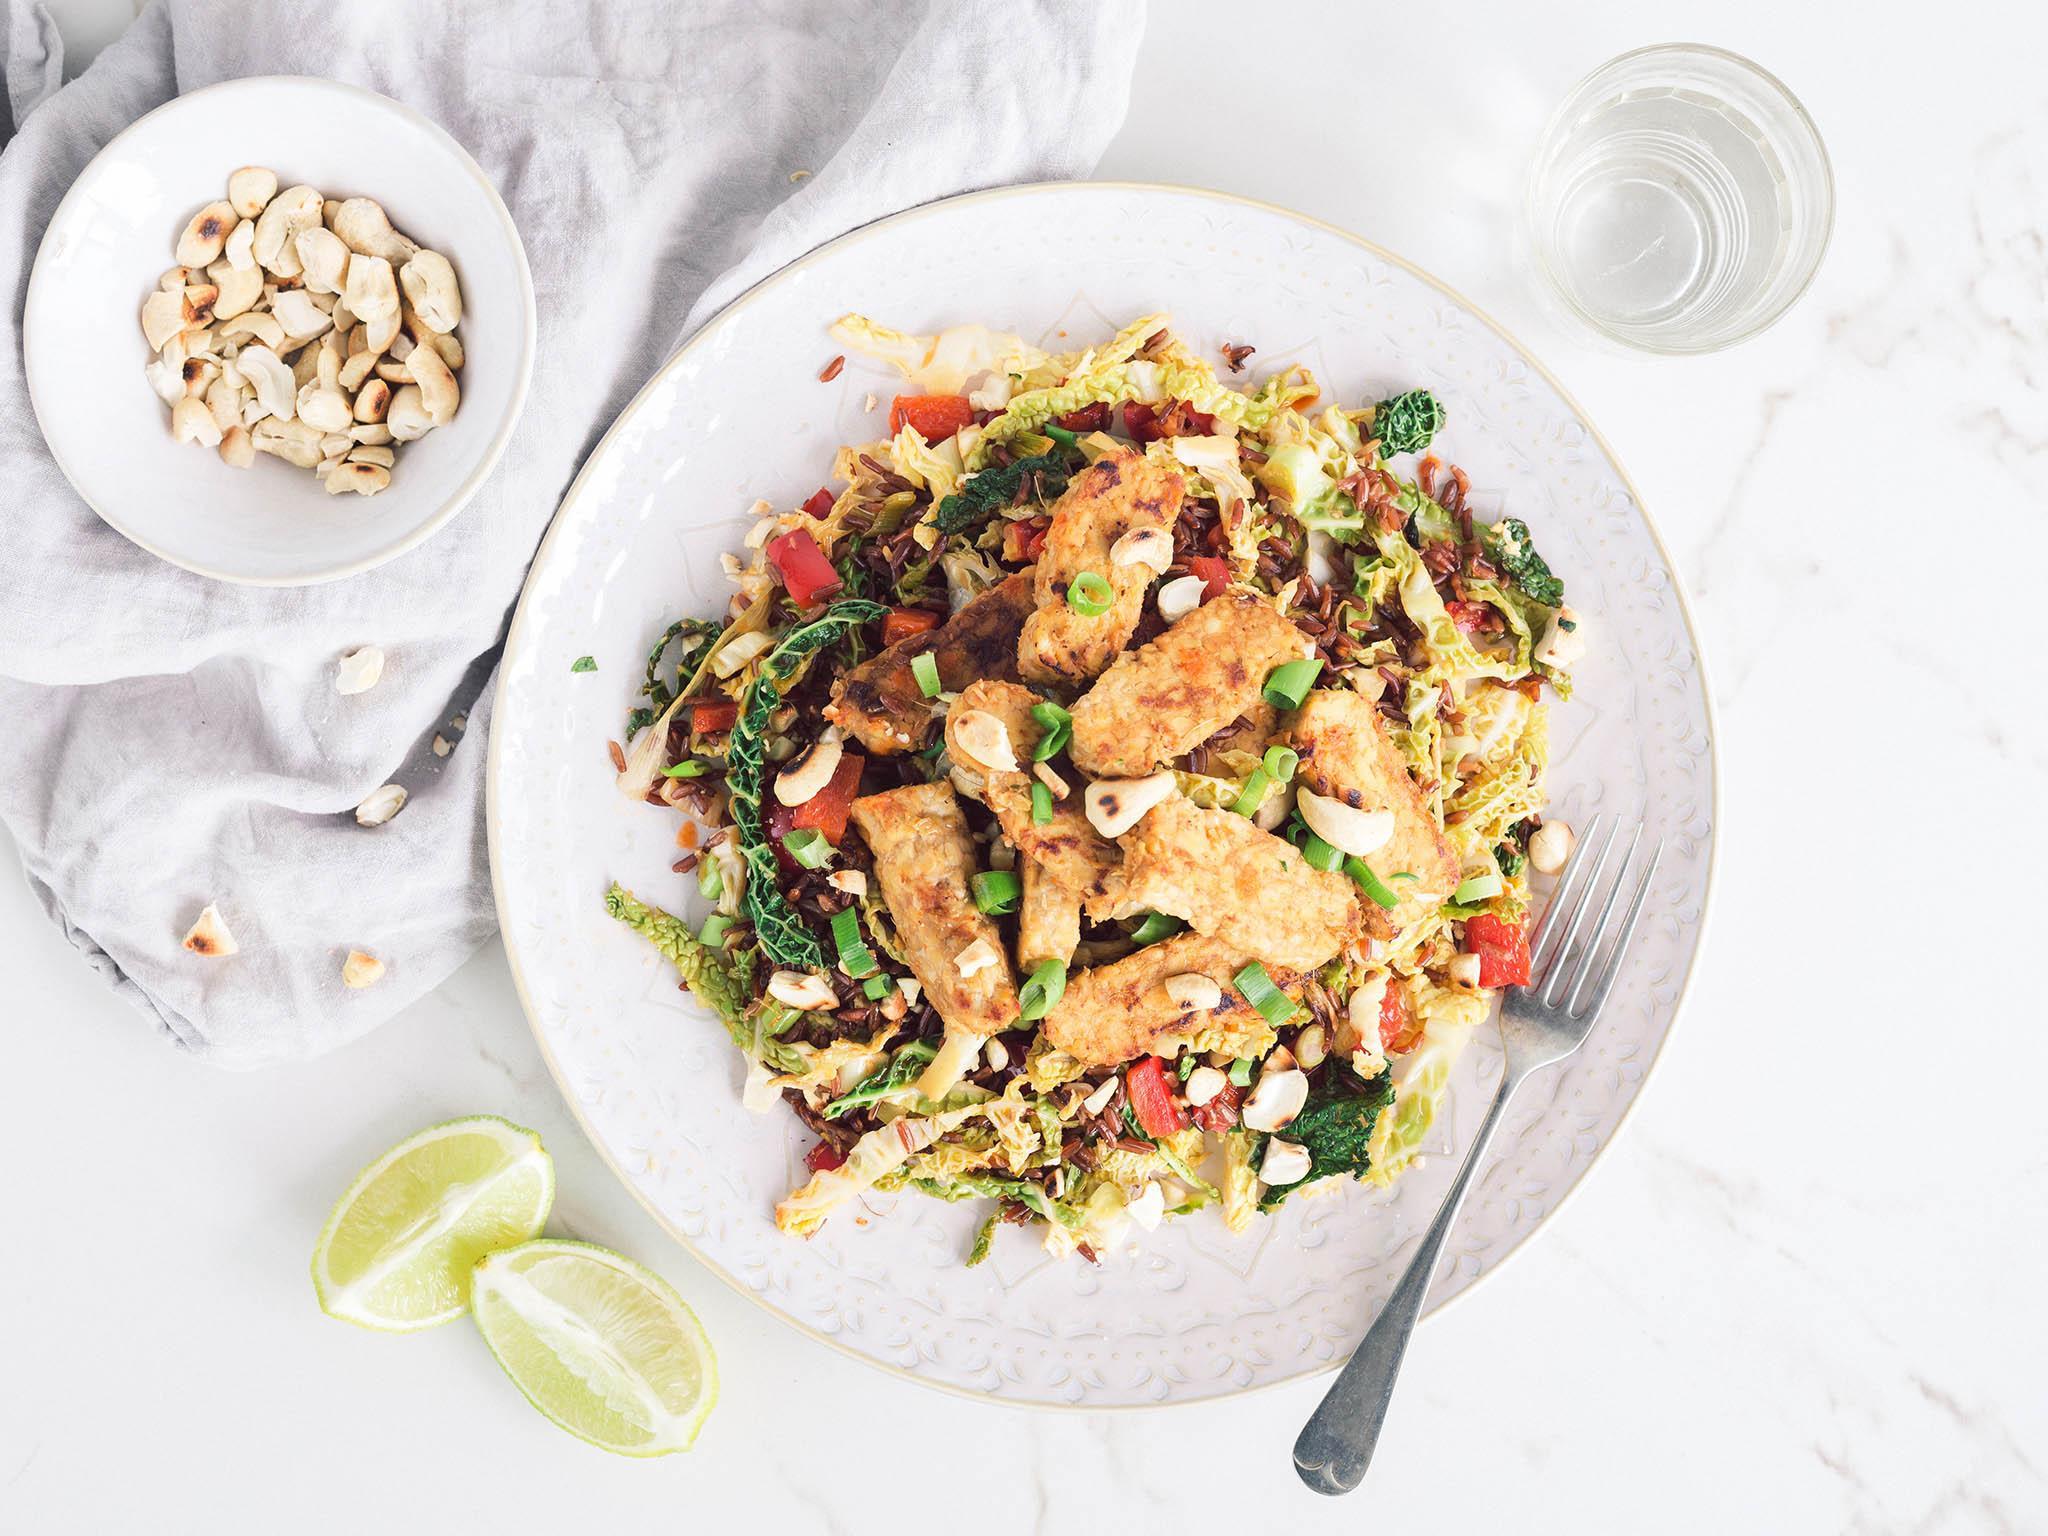 How to make nasi goreng with ginger tofu and red rice 1